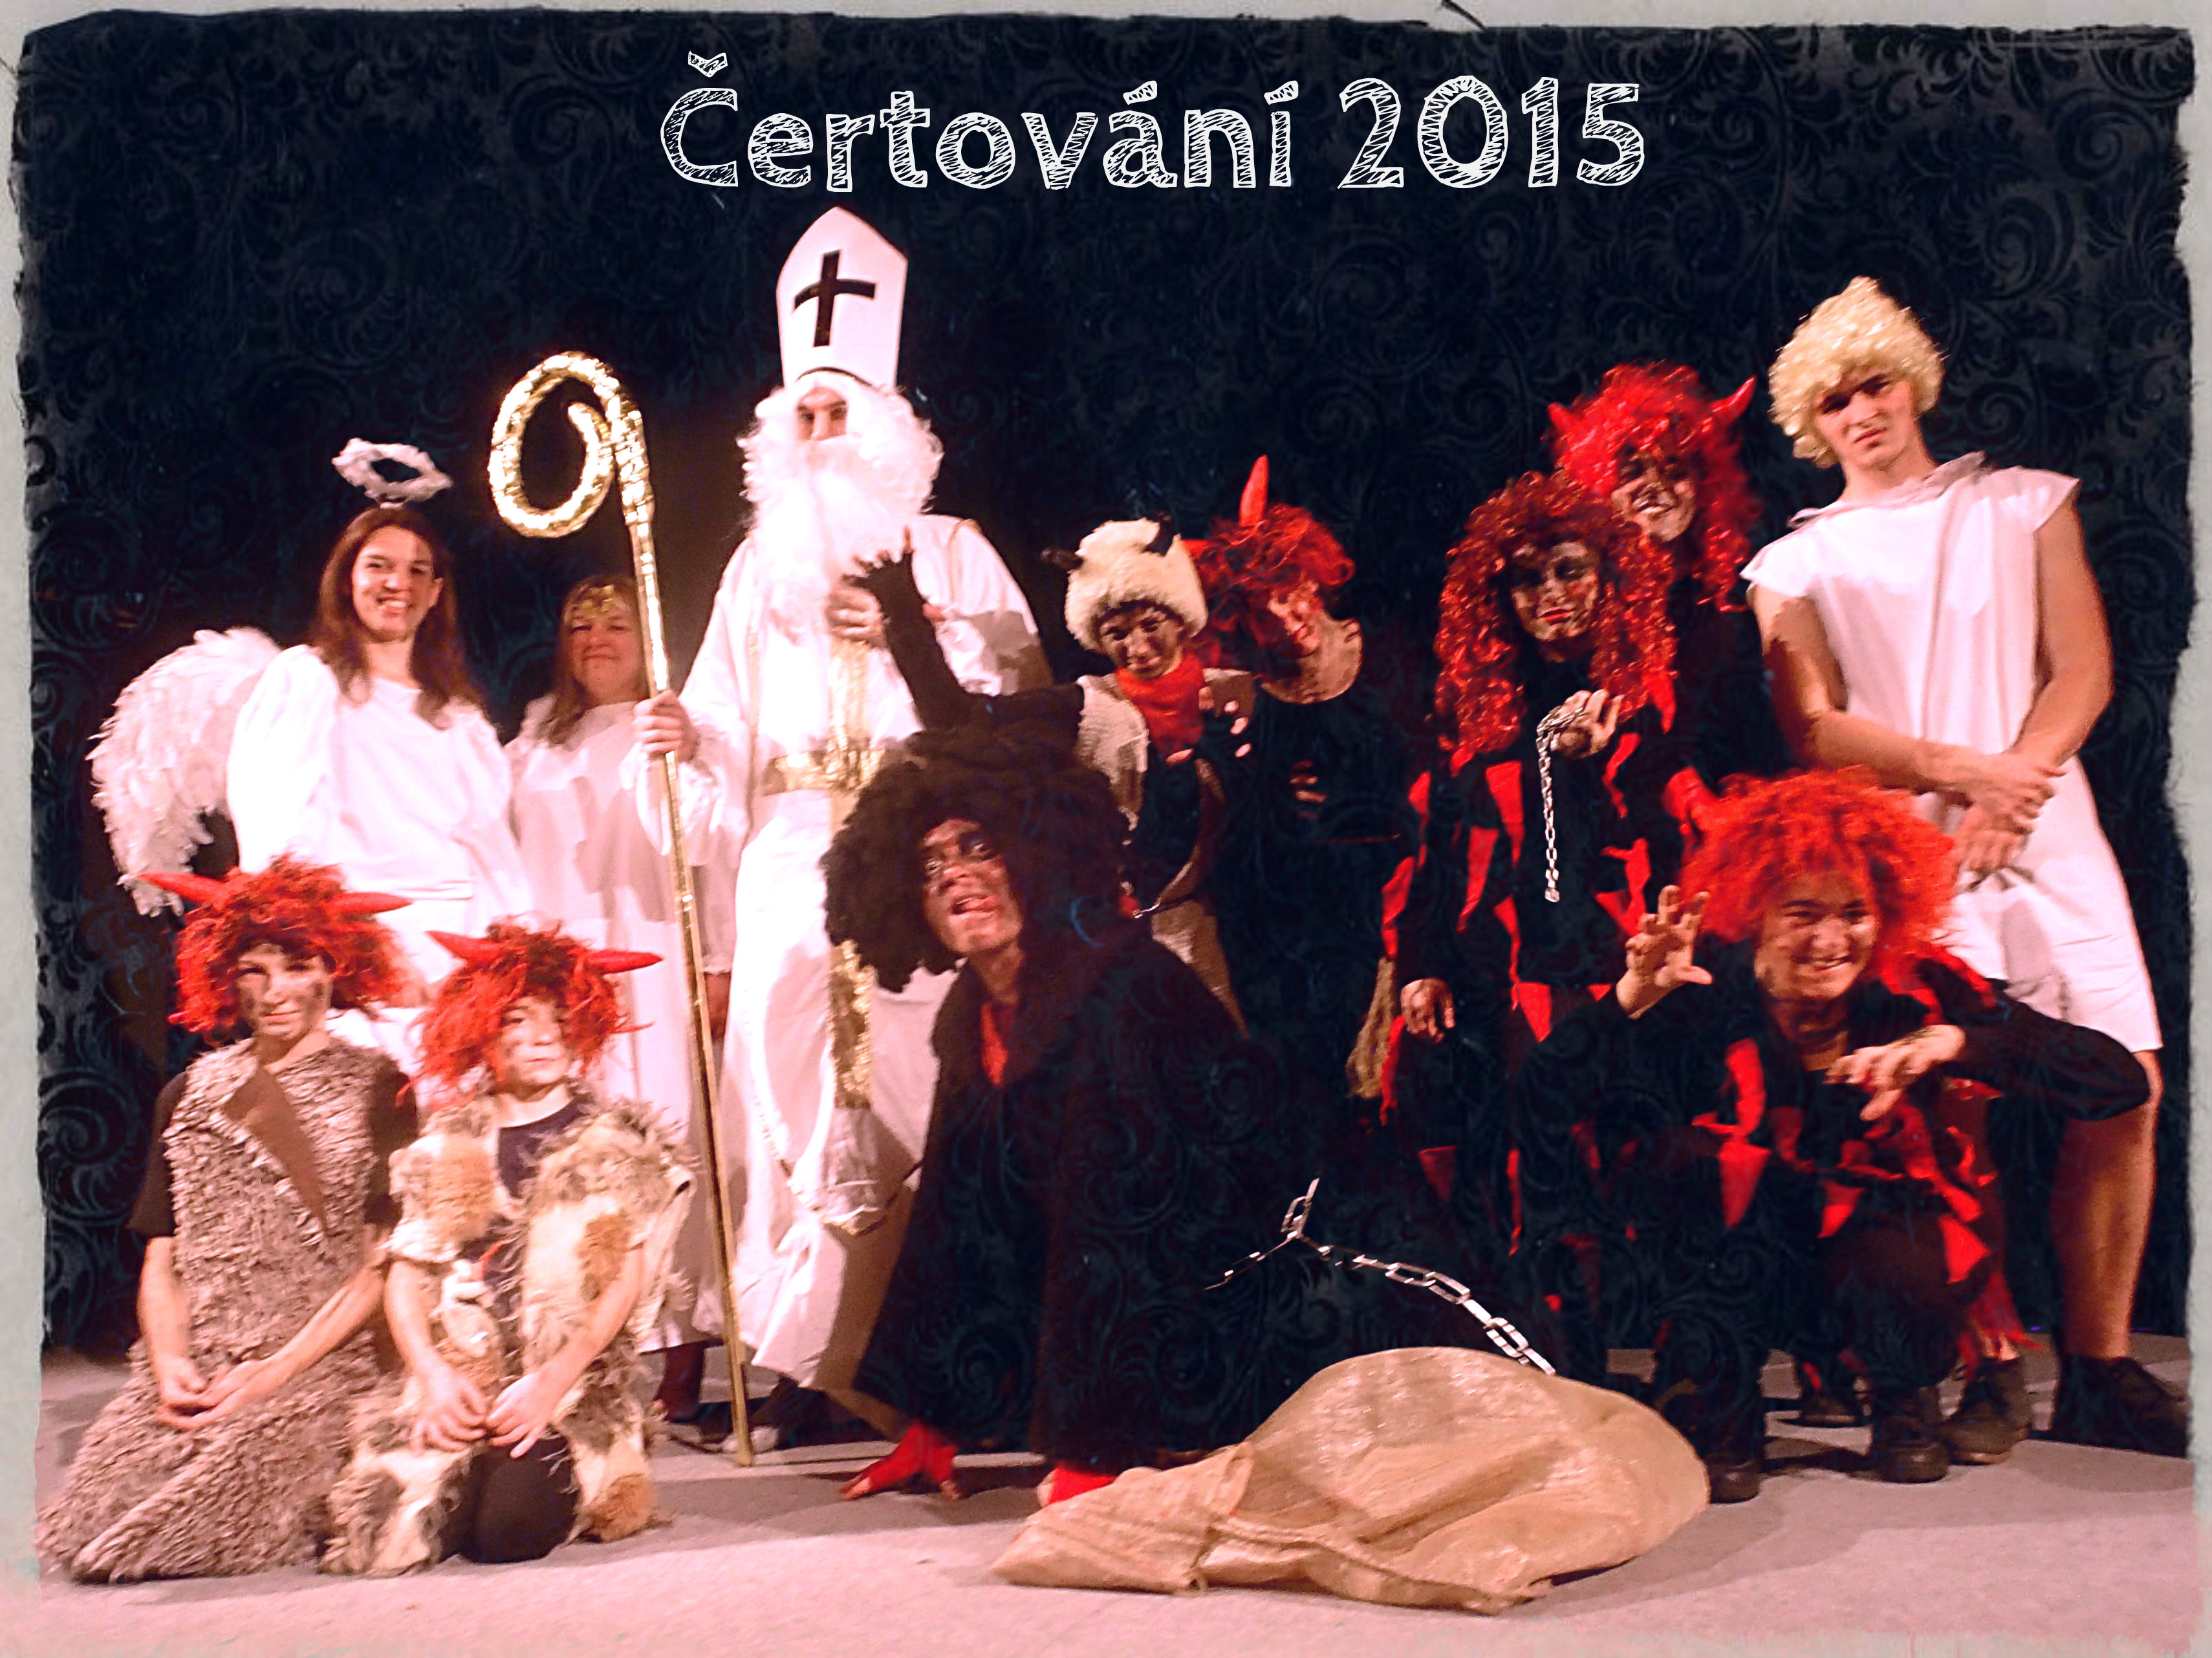 Certovani 2015 - s textem